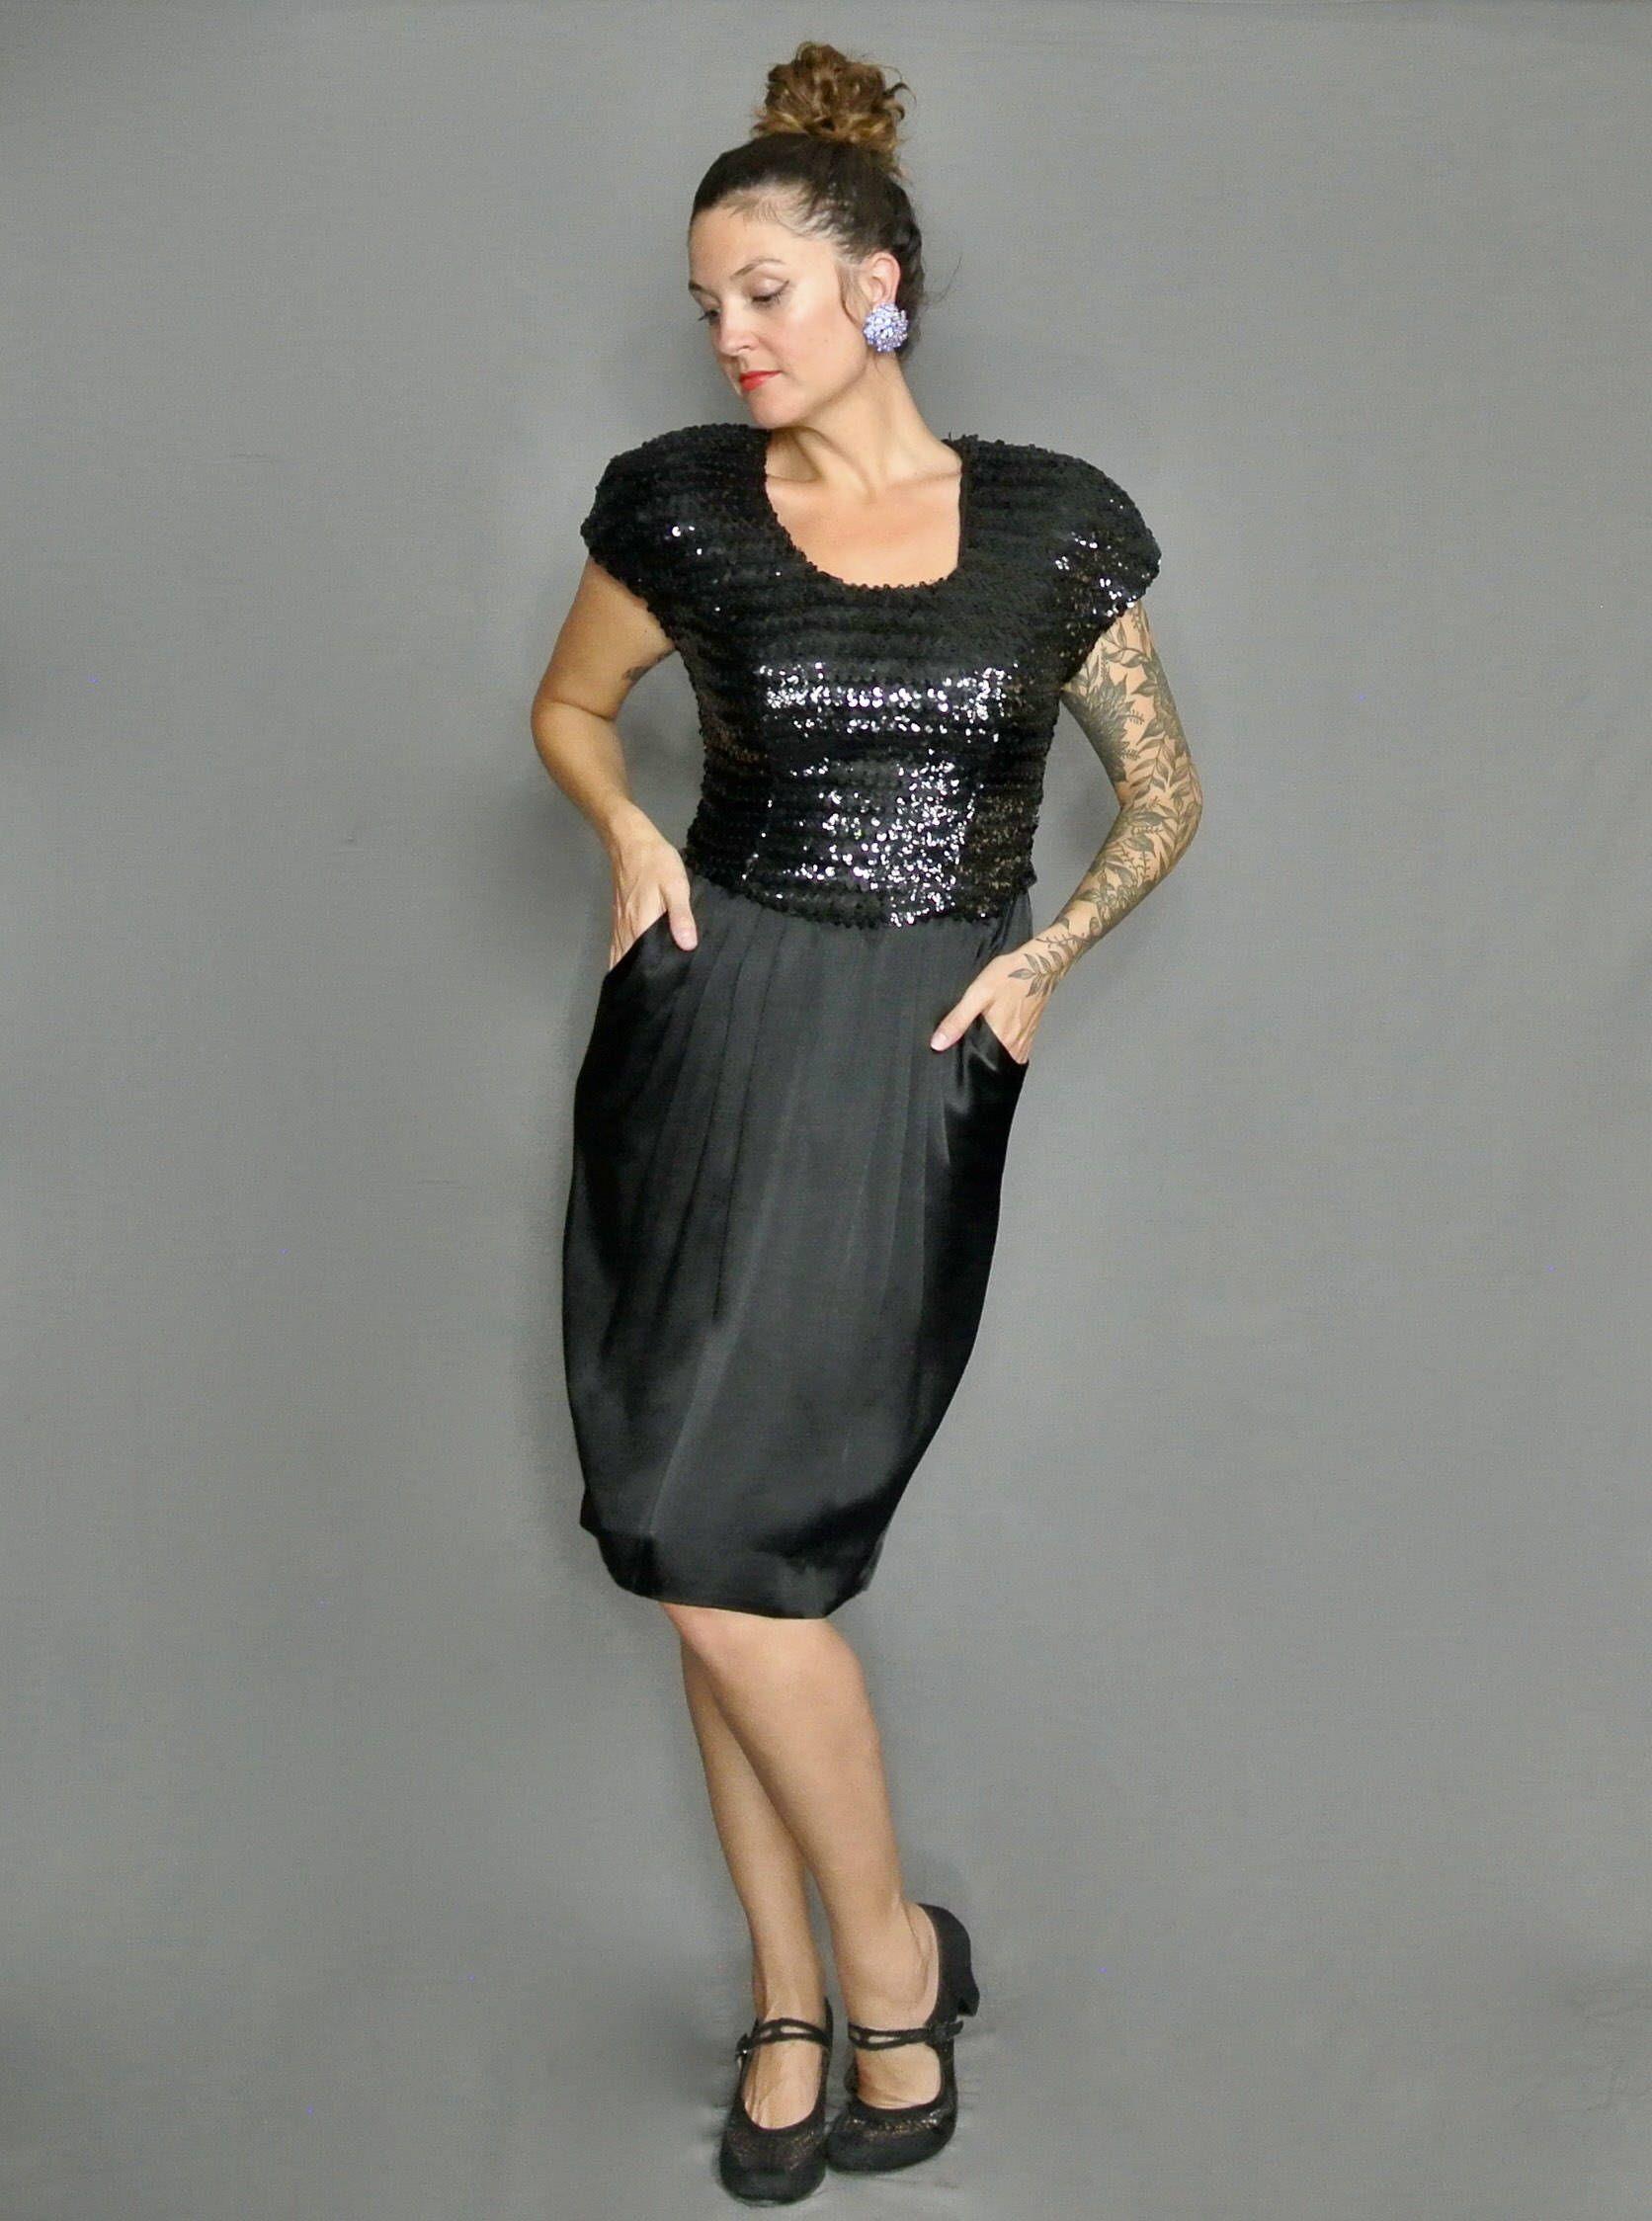 bf69993d Vintage 80s Little Black Sequence Dress (Taurus Nites) by DeltaRoseBoutique  on Etsy